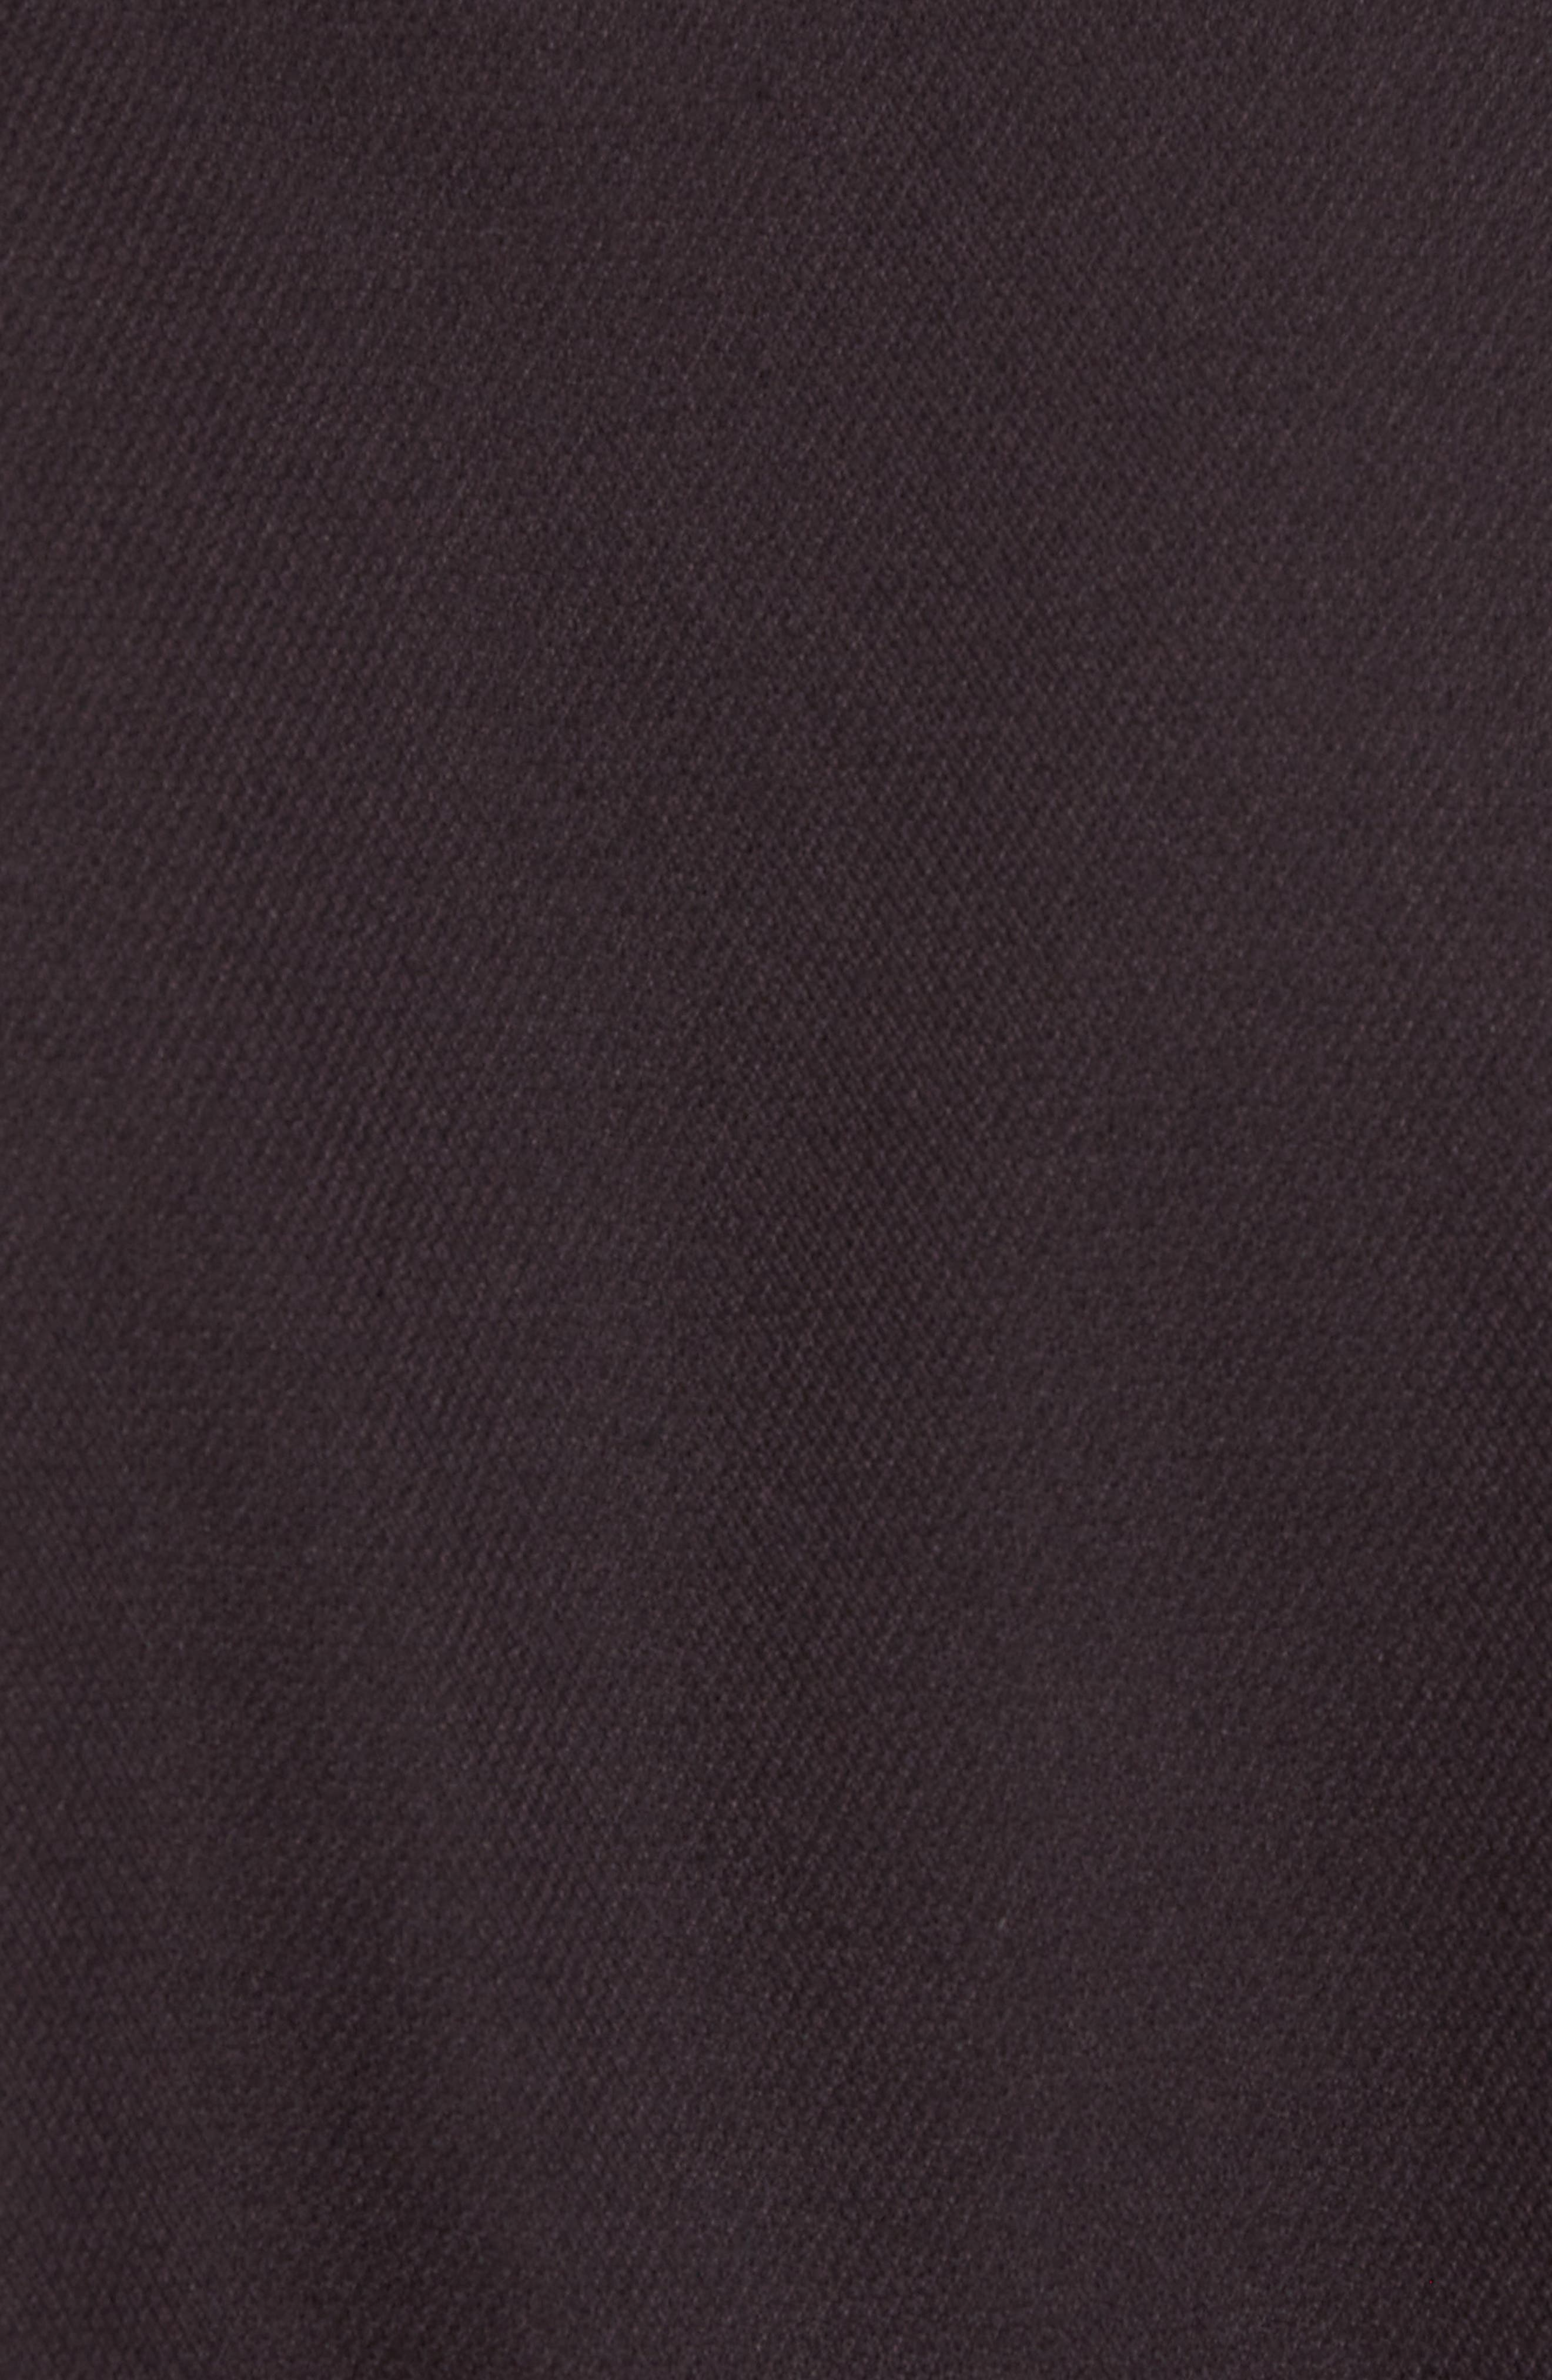 Digon Dobby Shirt,                             Alternate thumbnail 14, color,